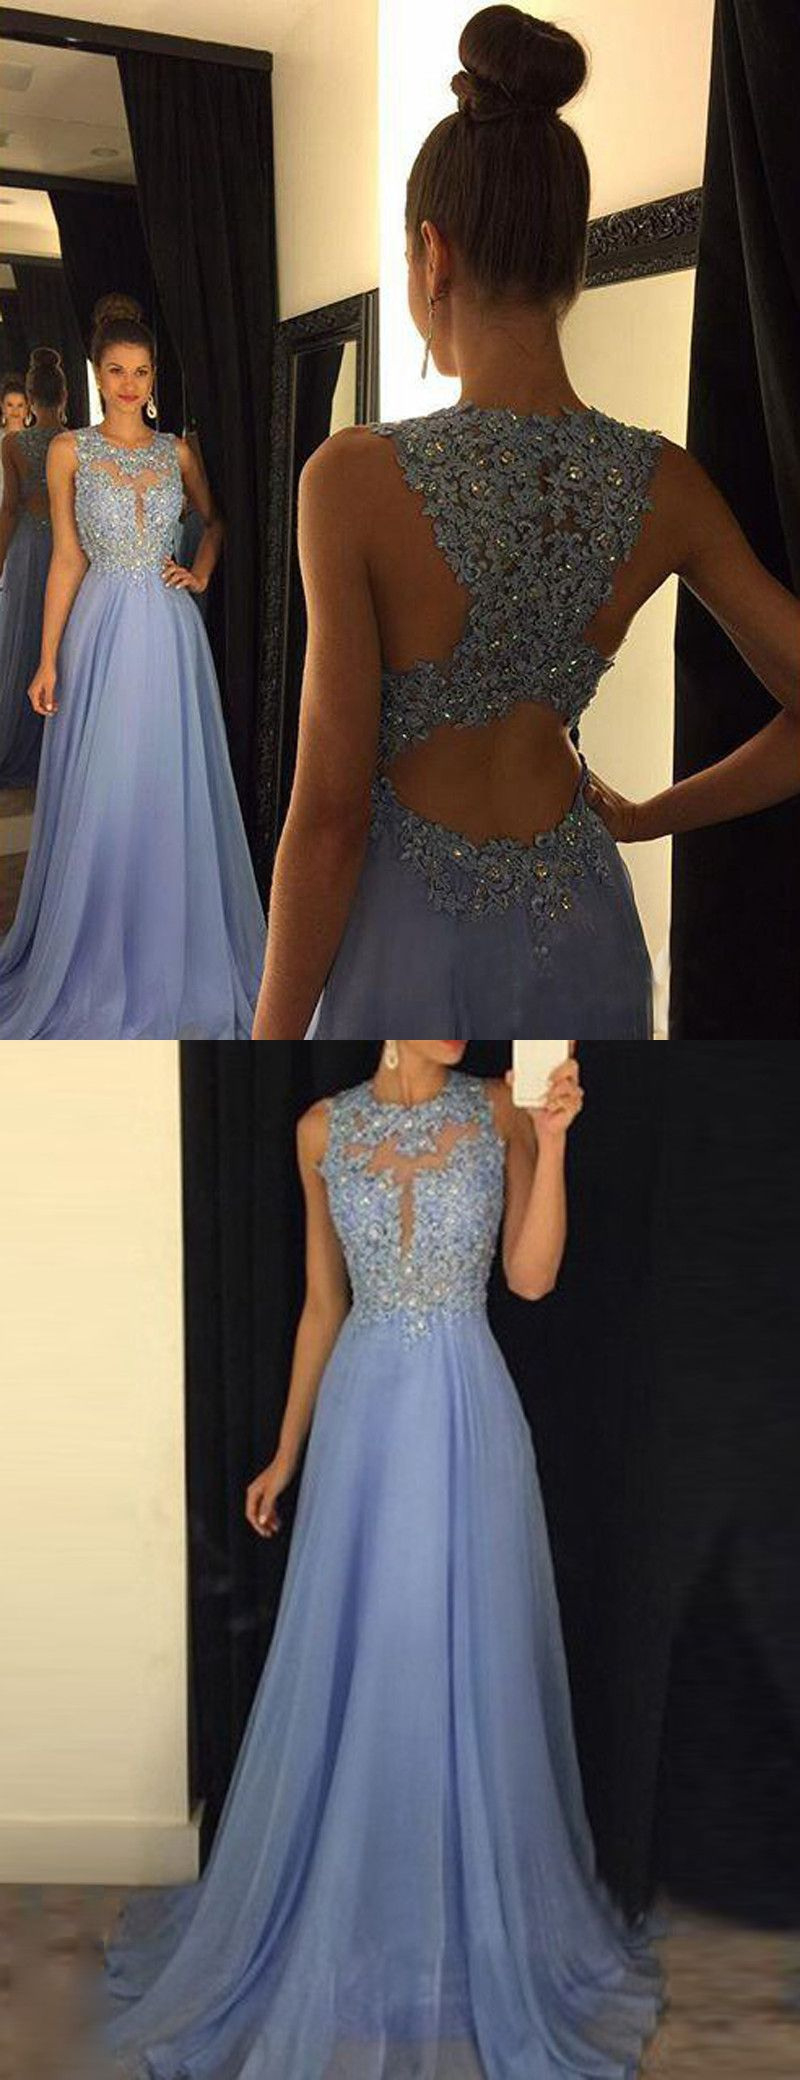 15 Einfach Abend Kleid Elegant Lang VertriebDesigner Fantastisch Abend Kleid Elegant Lang Vertrieb